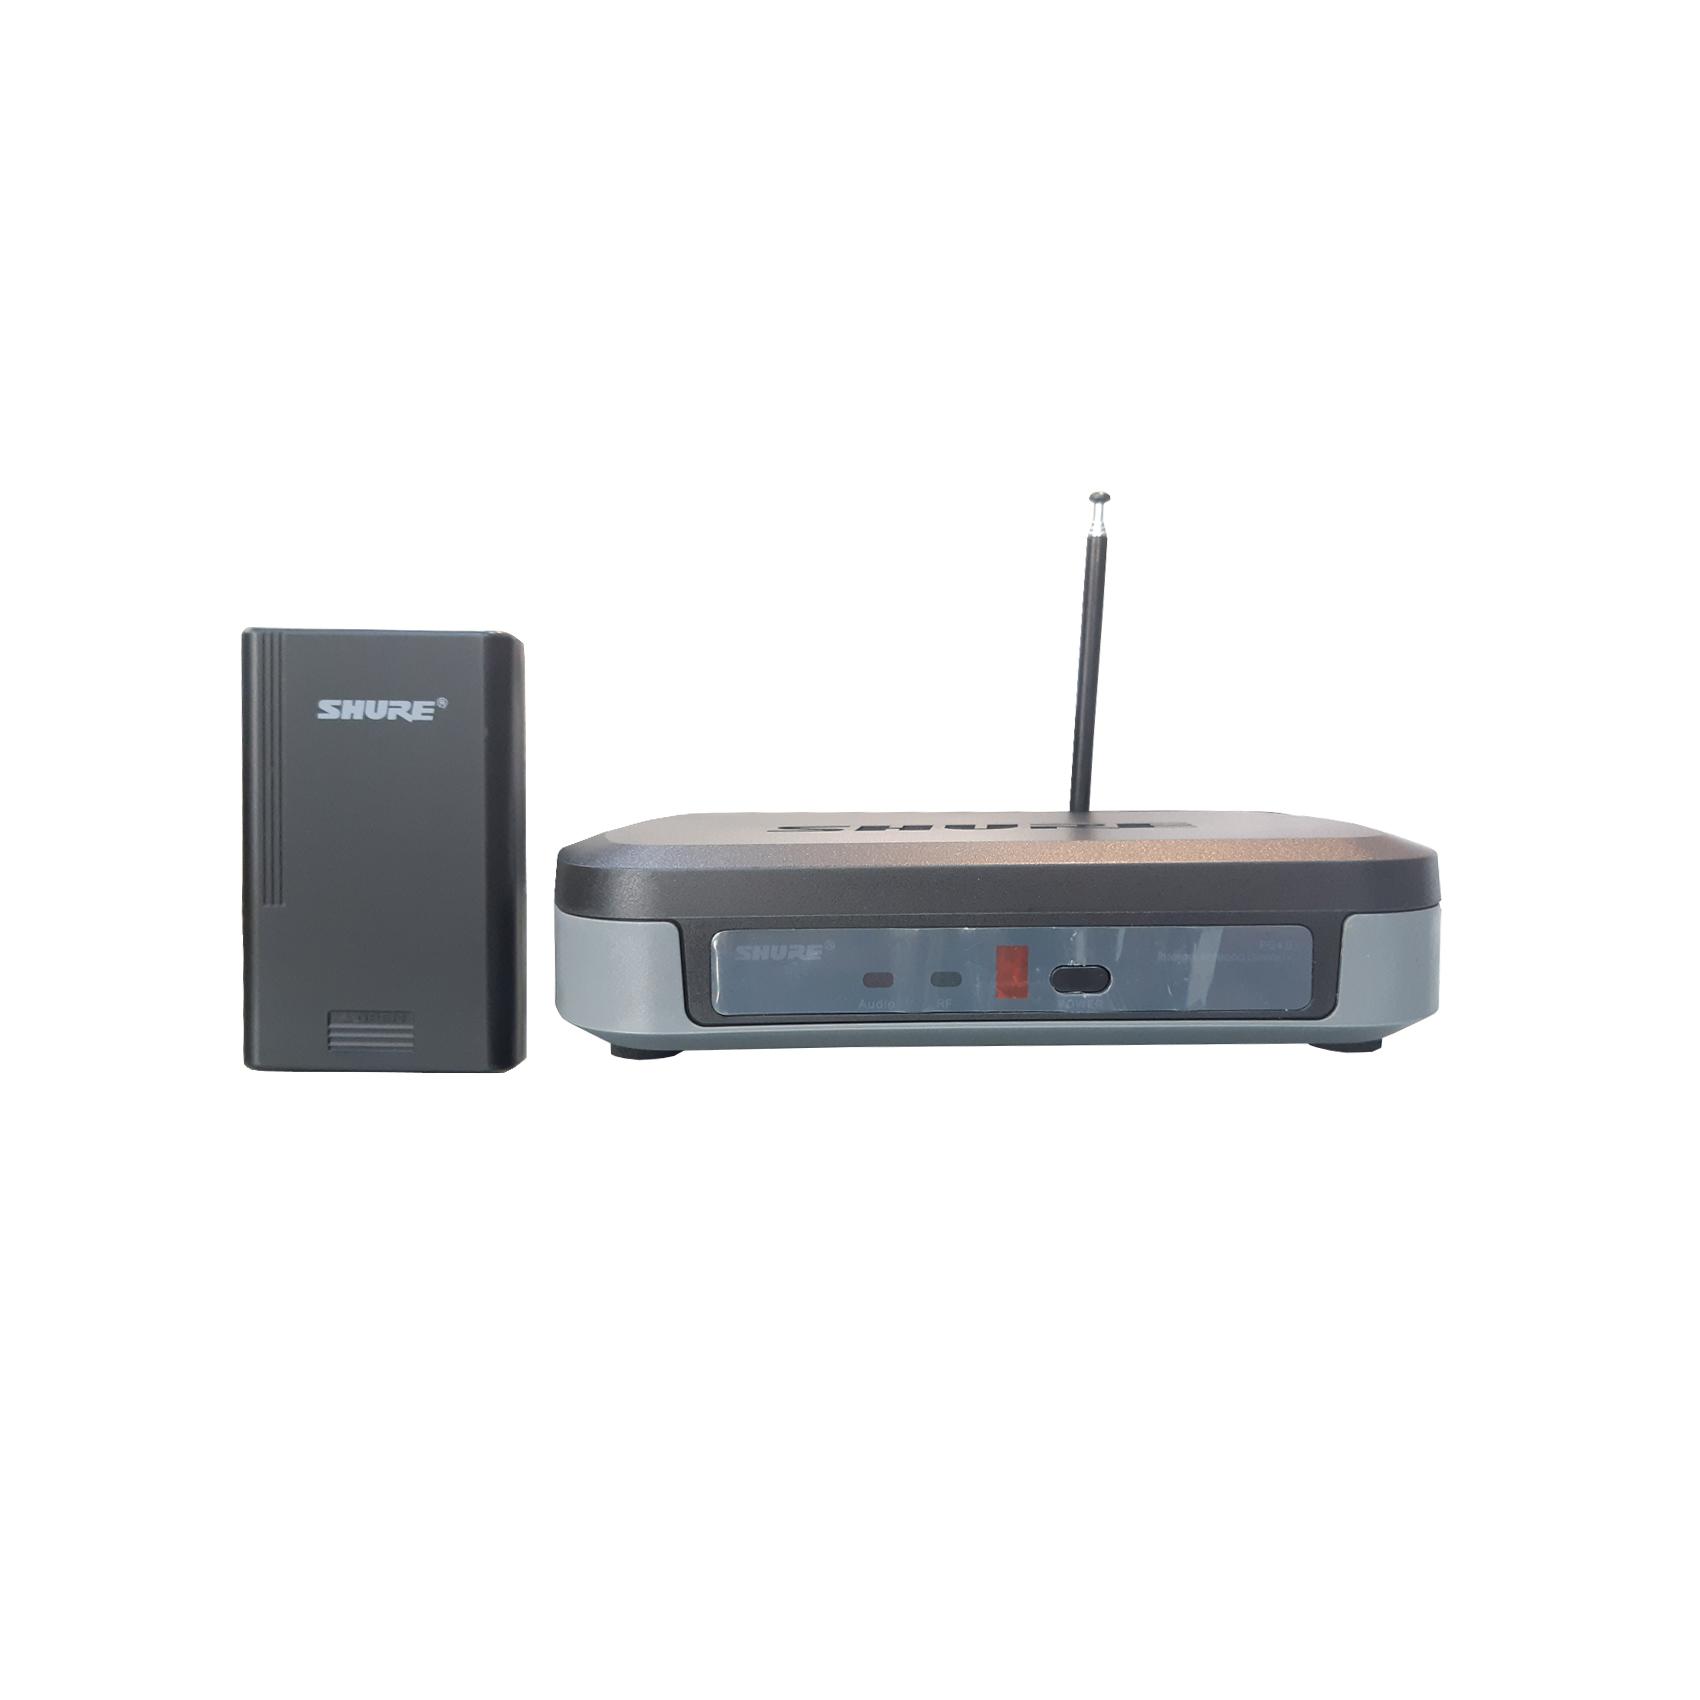 Shure wireless soundco.ir